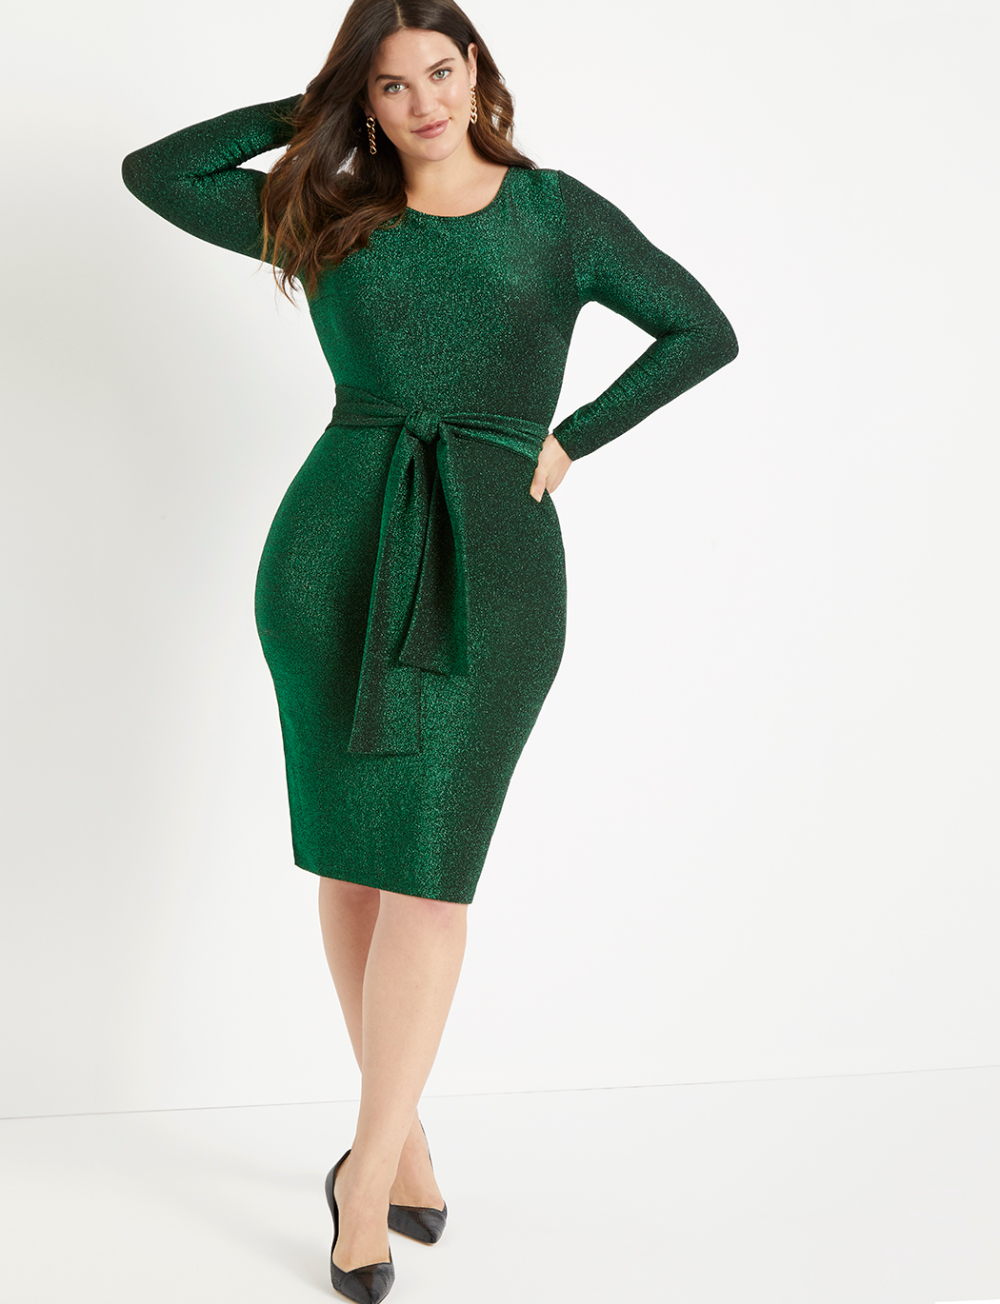 Lurex Tie Waist Dress Women's Plus Size Dresses